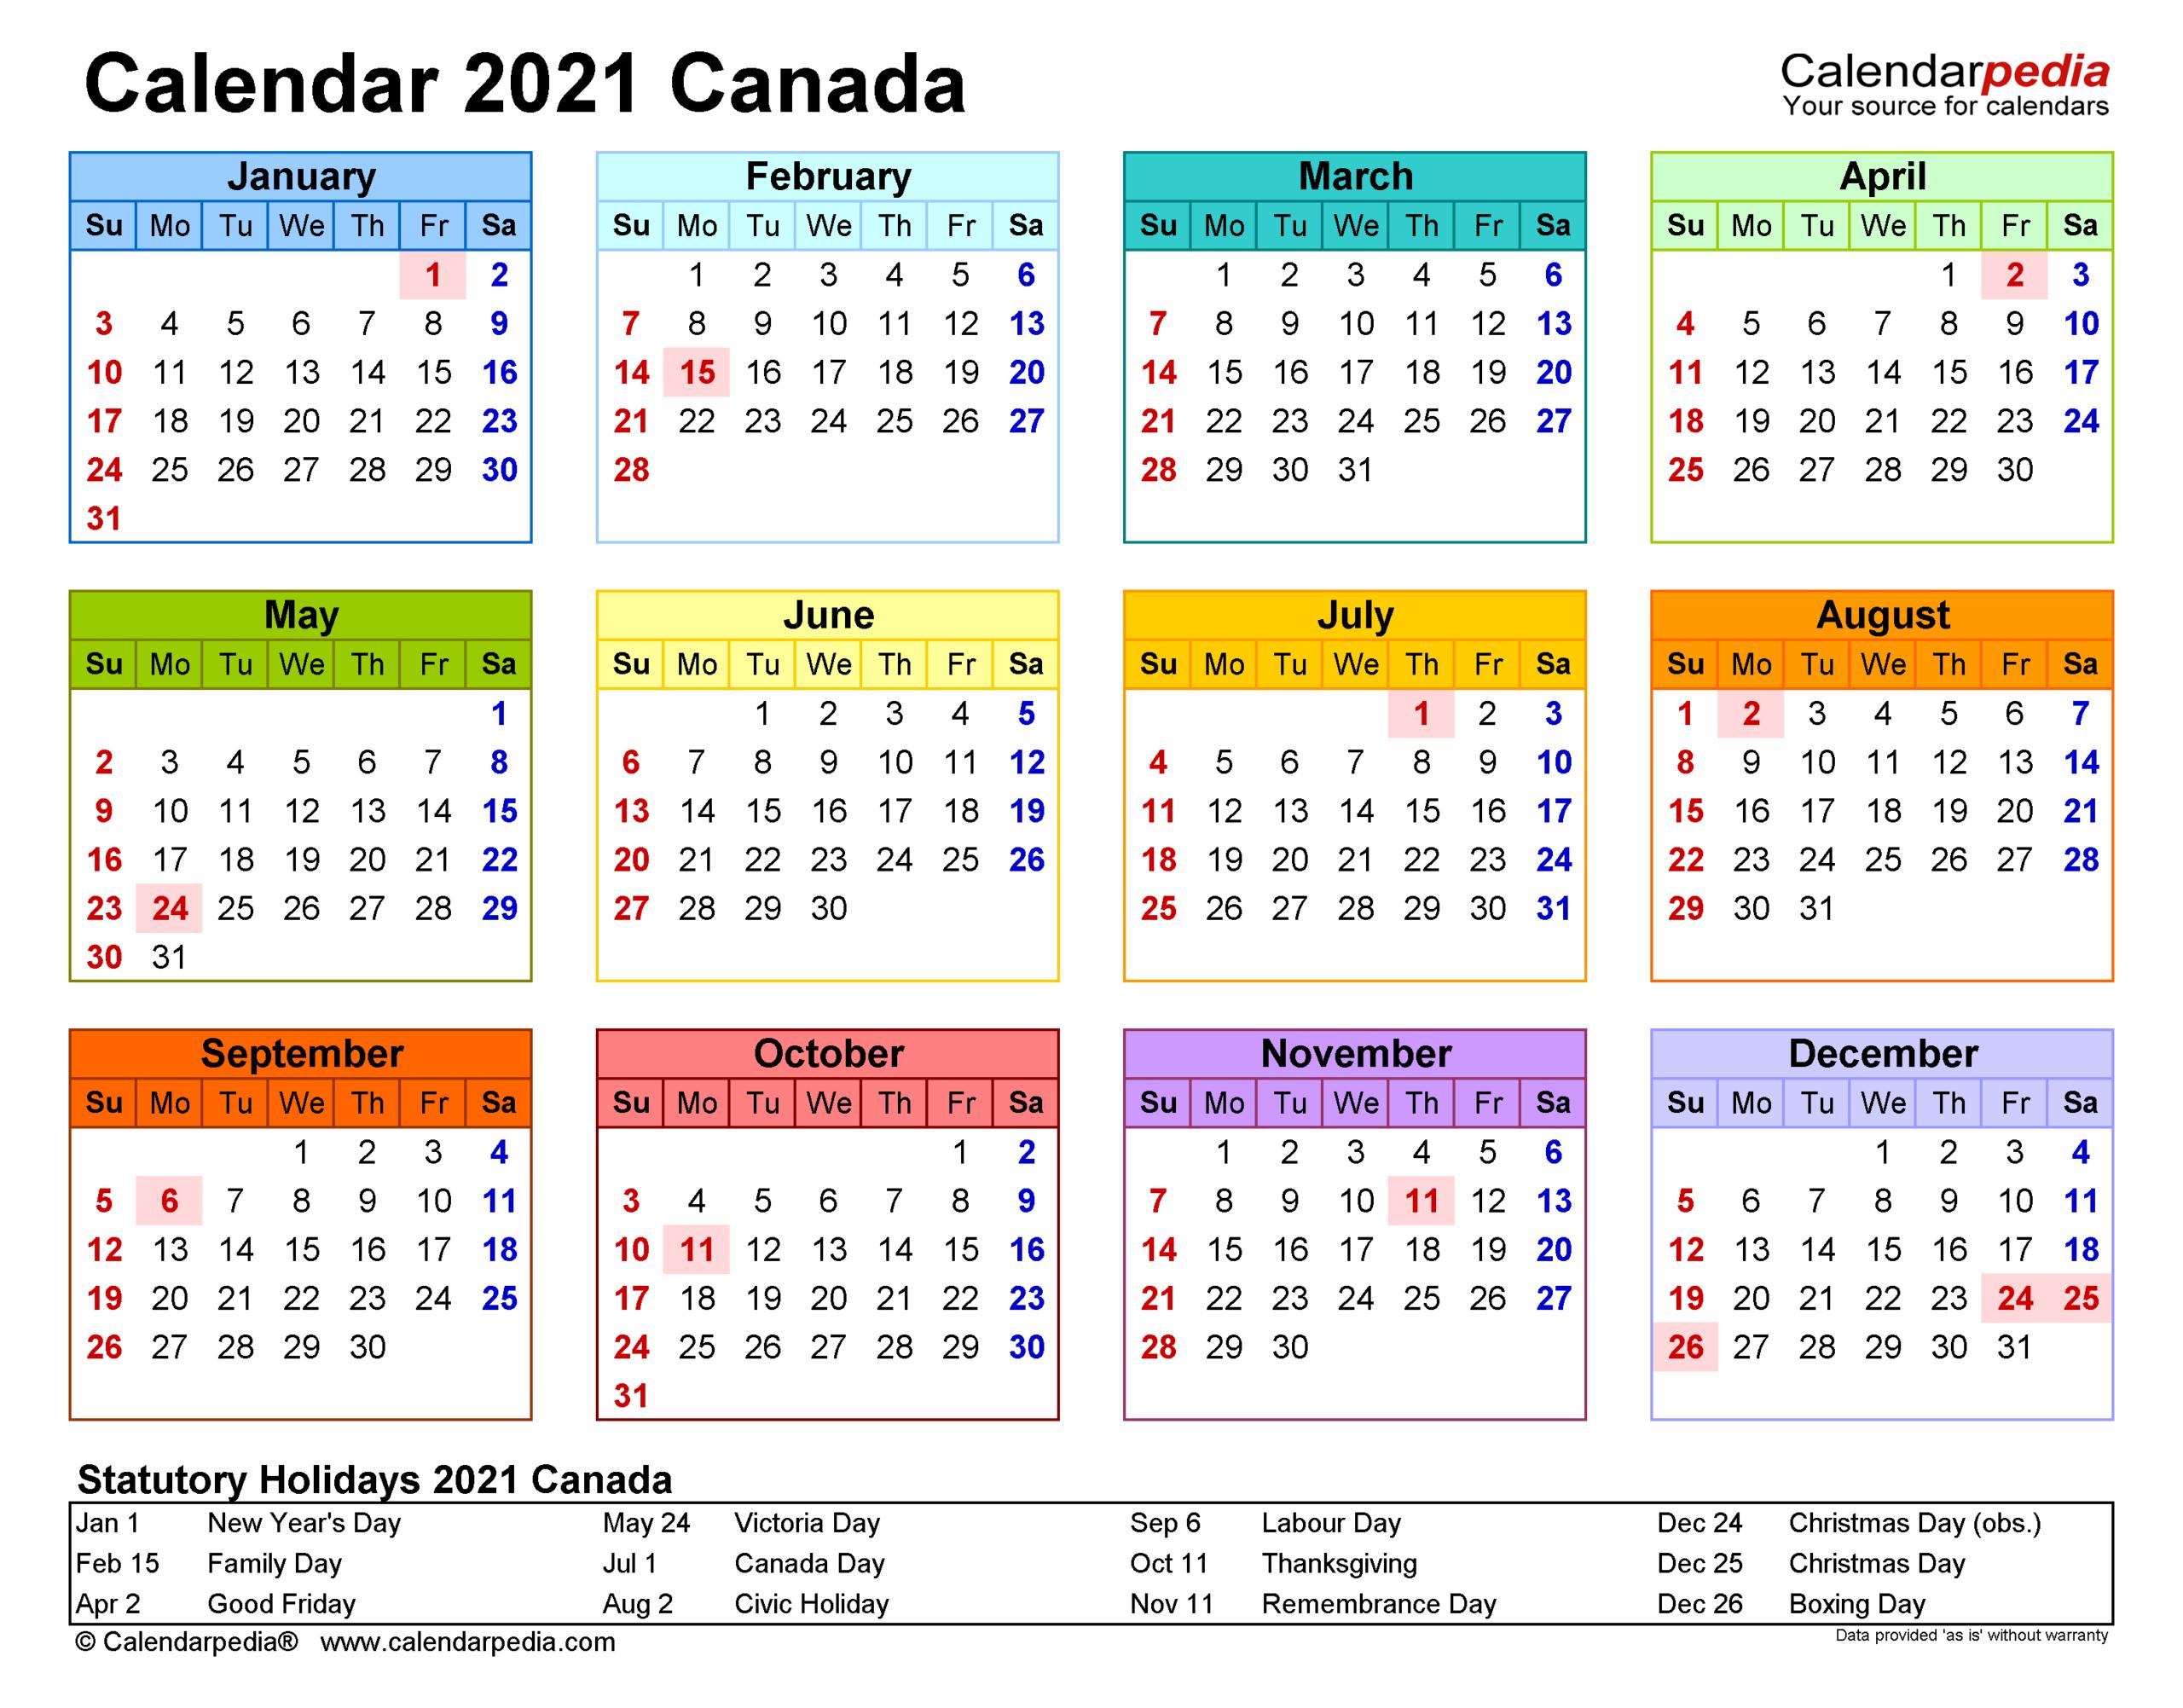 Canada Calendar 2021 - Free Printable Word Templates